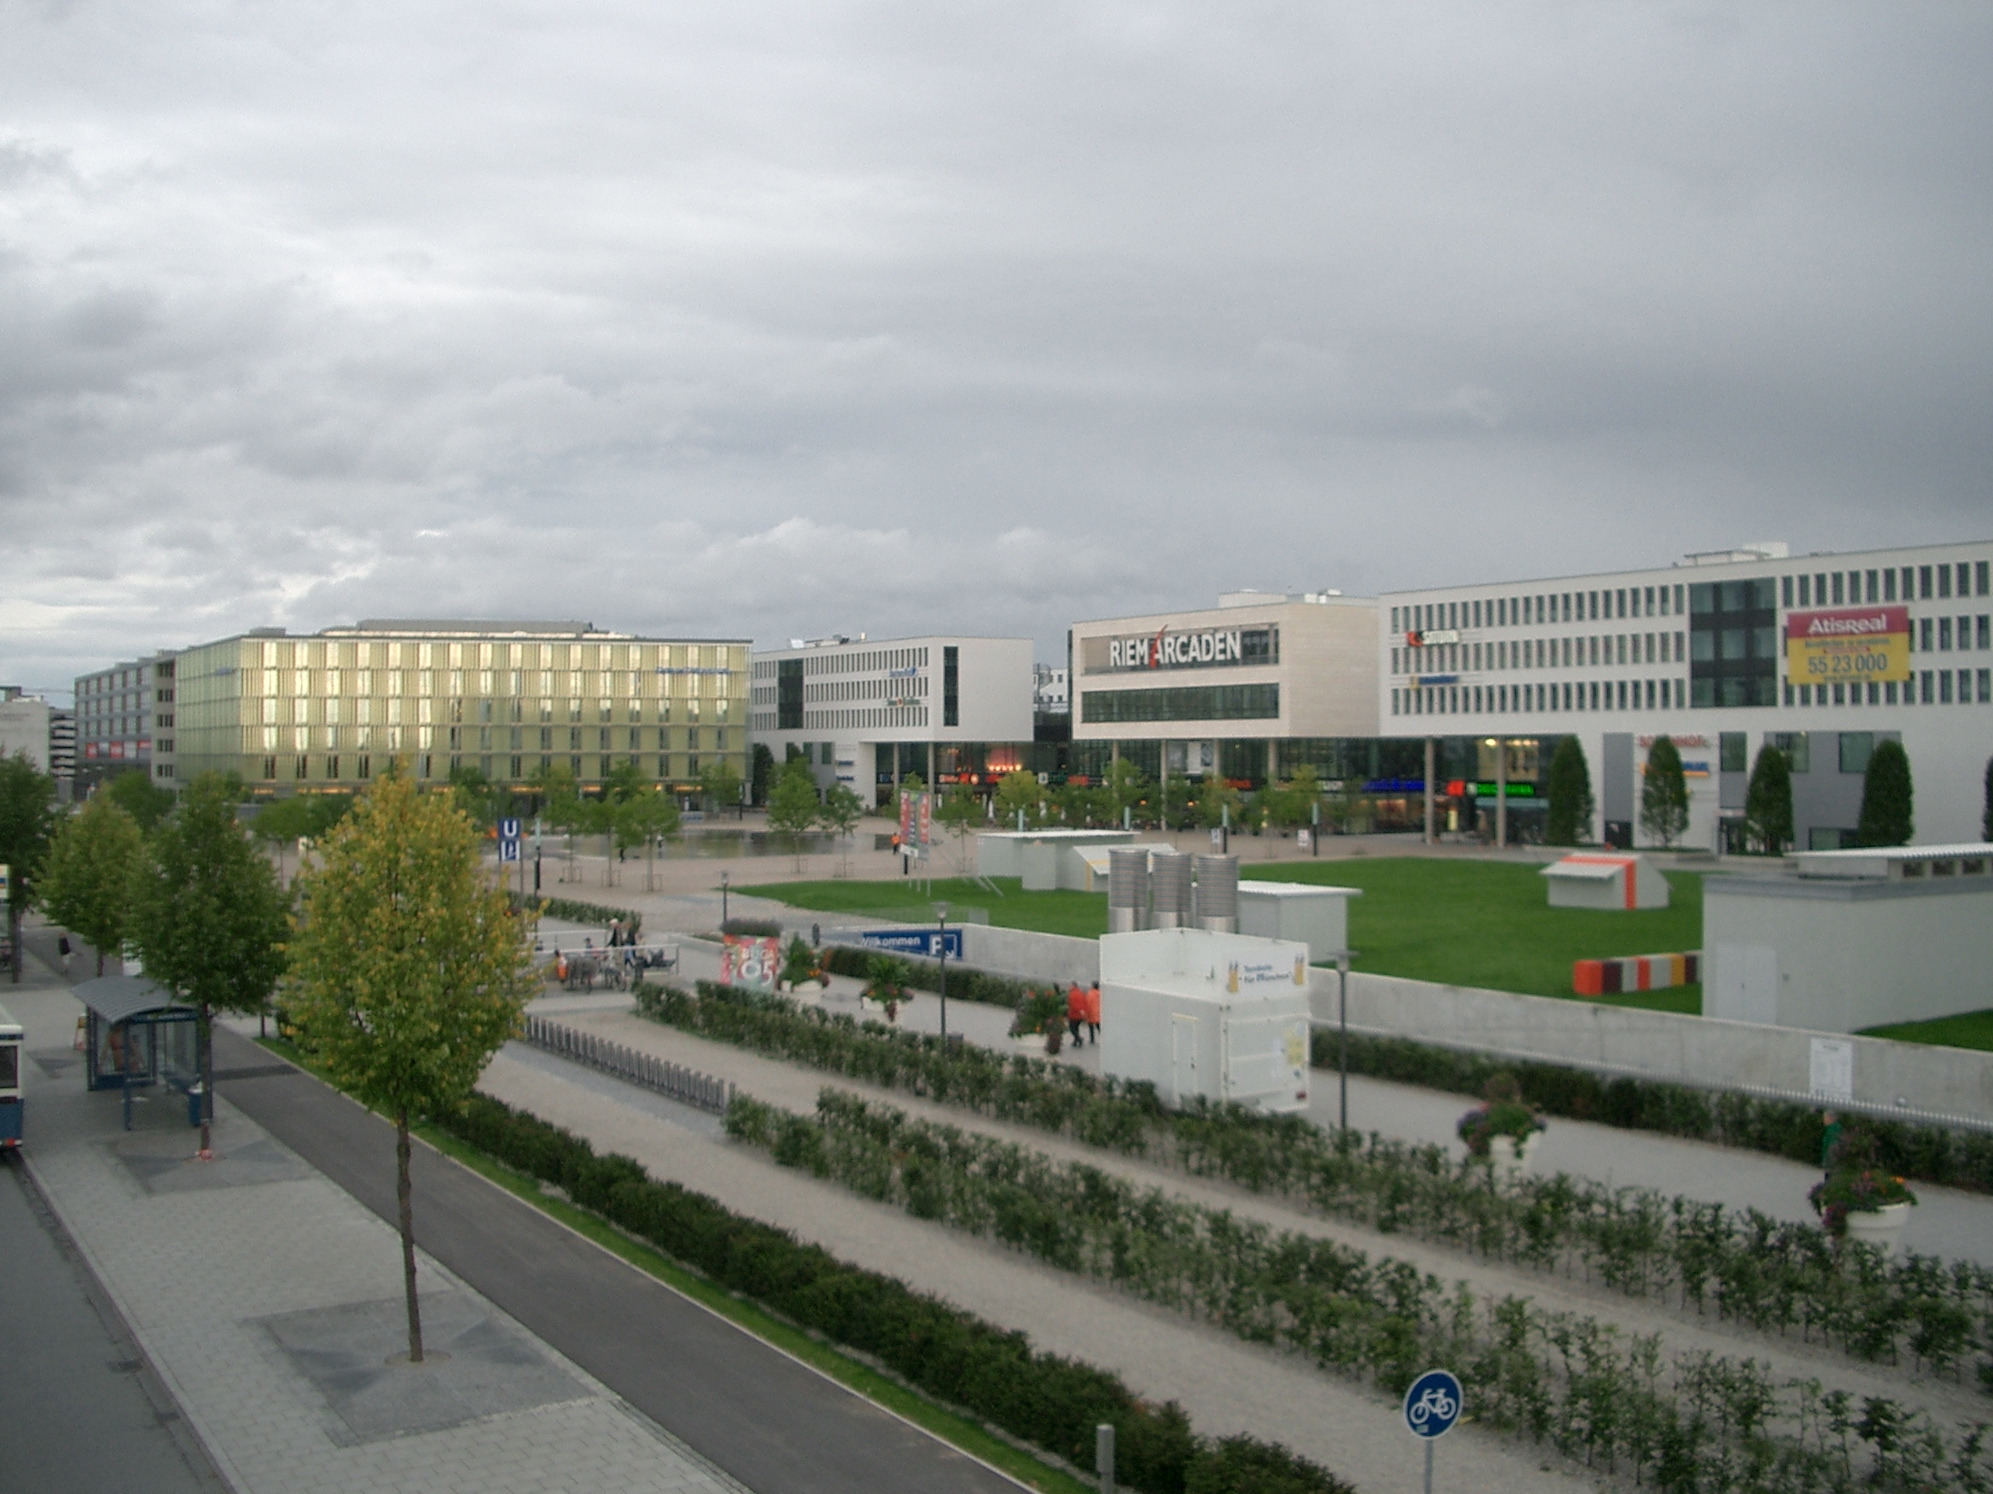 Messestadt Riem Wikipedia